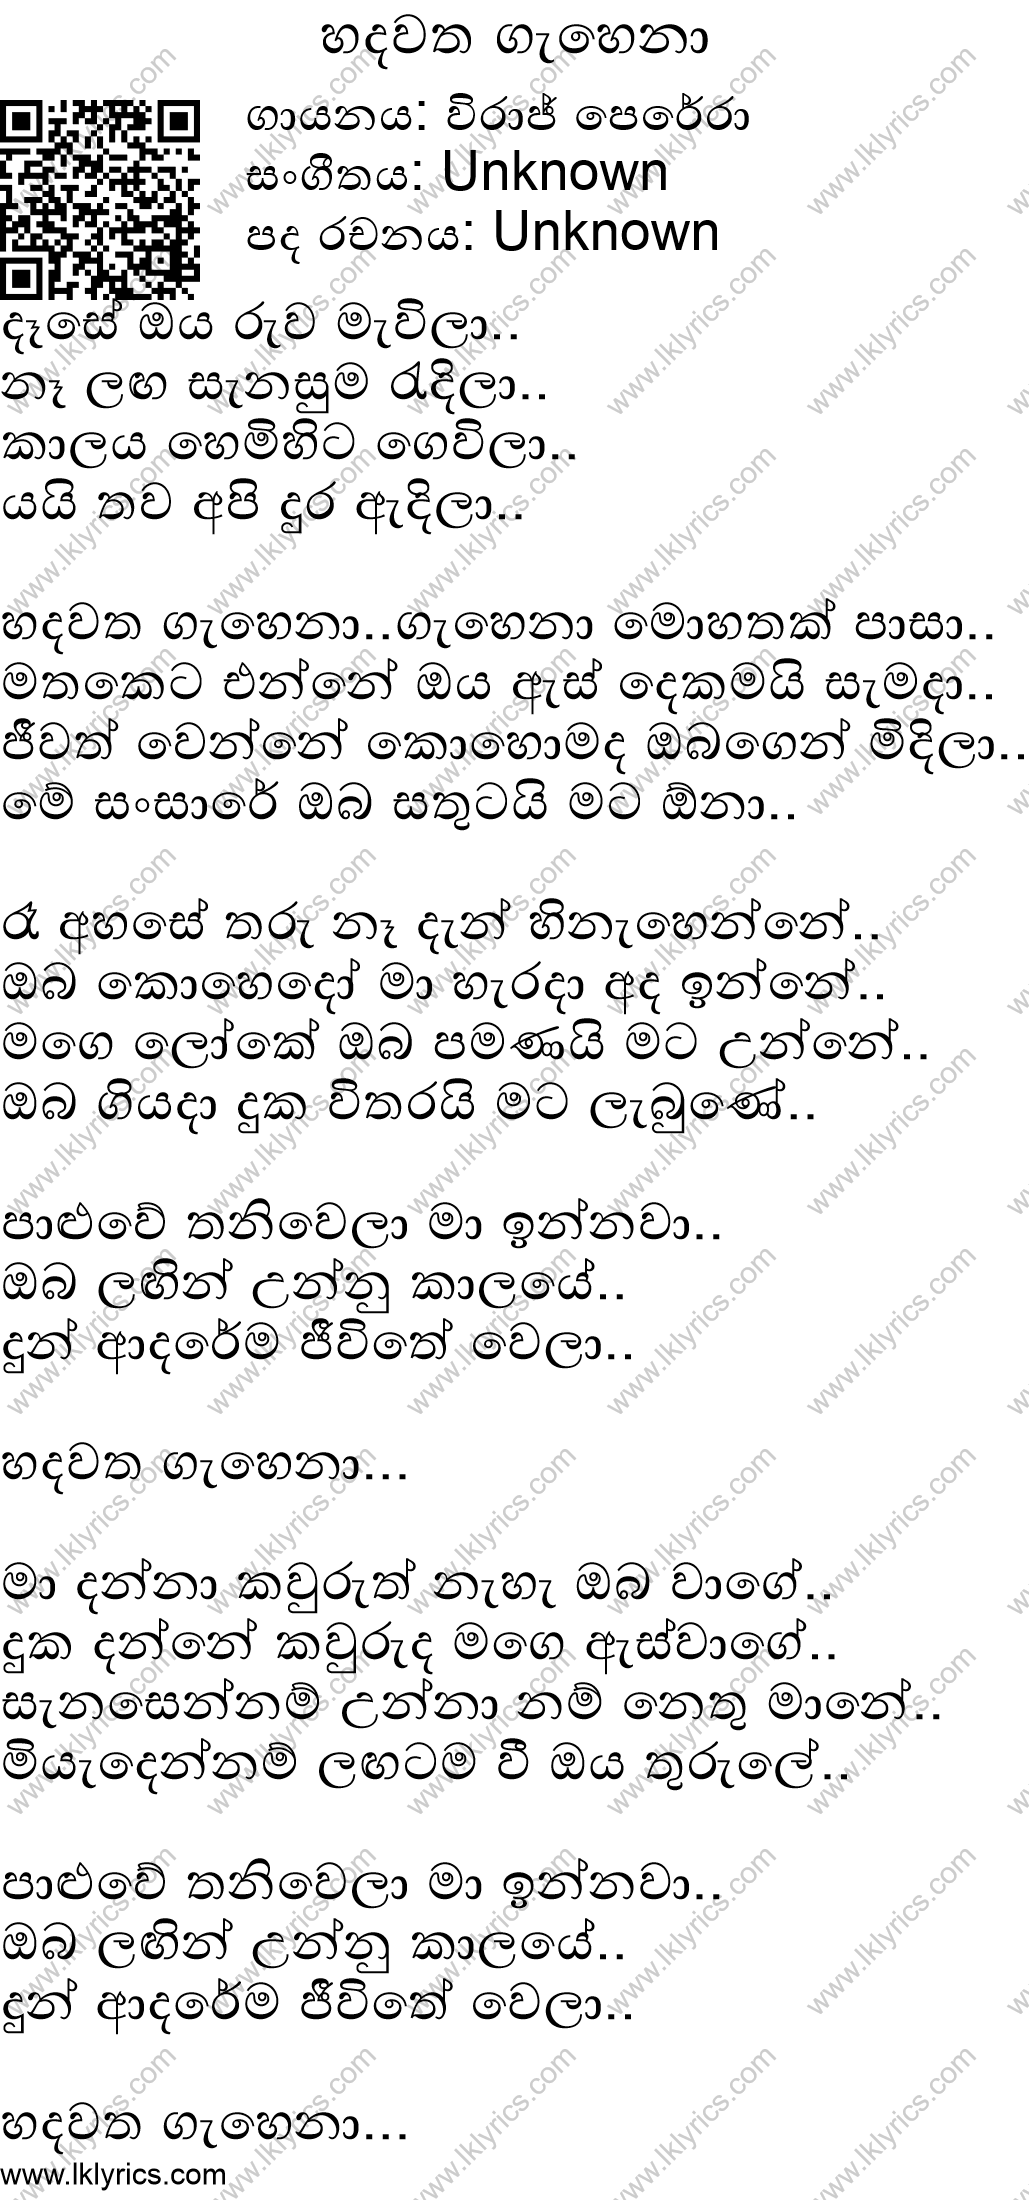 hadawatha gahena mohothak pasa mp3